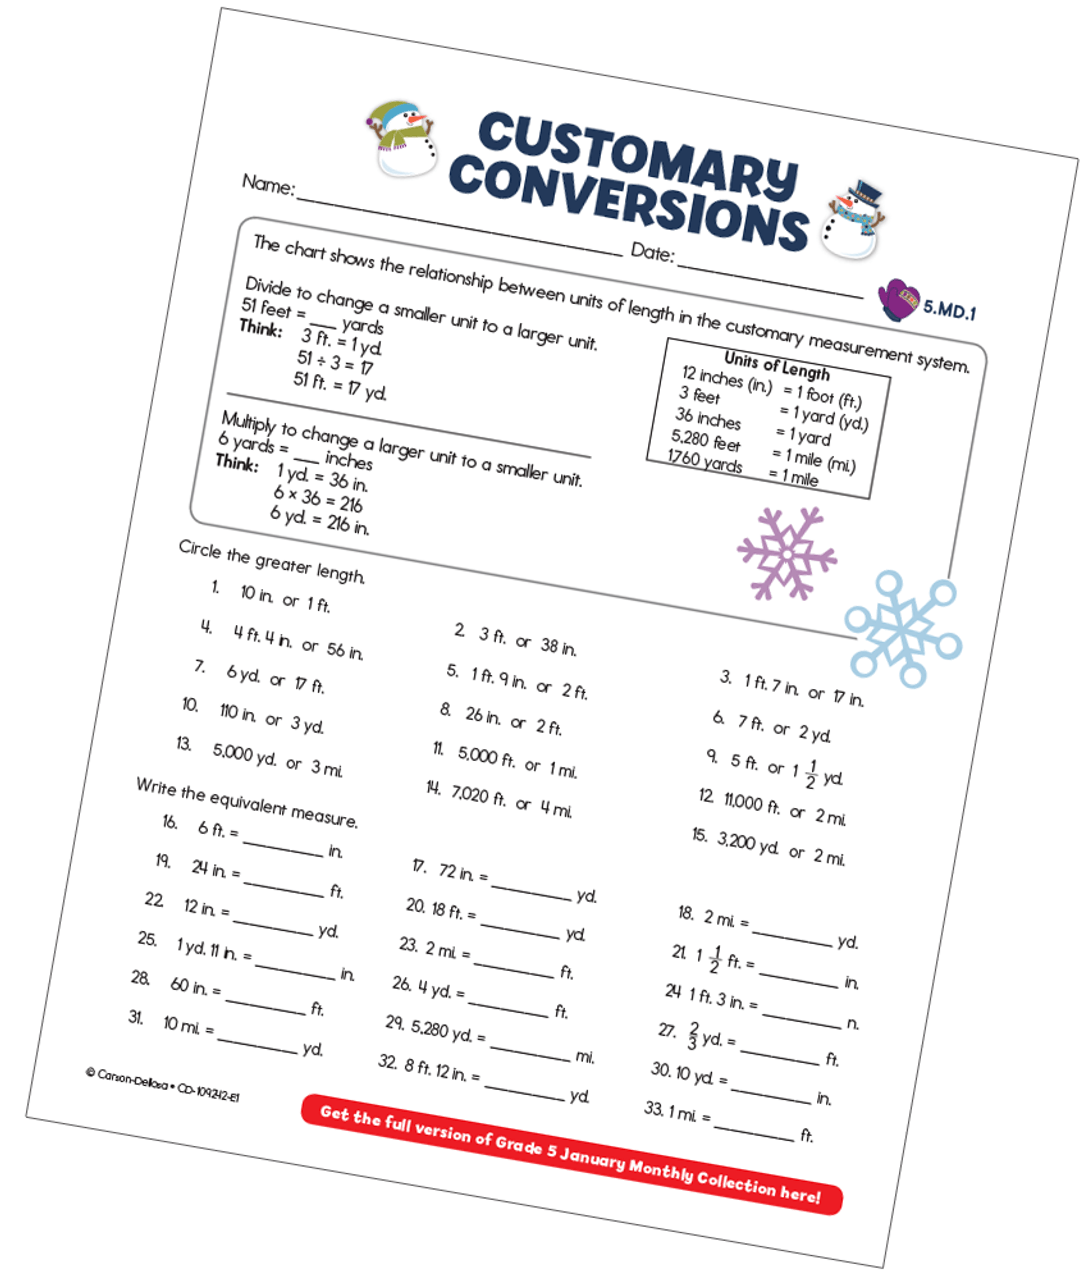 small resolution of Customary Conversions (Measurement) Free Printable - Carson Dellosa  Education